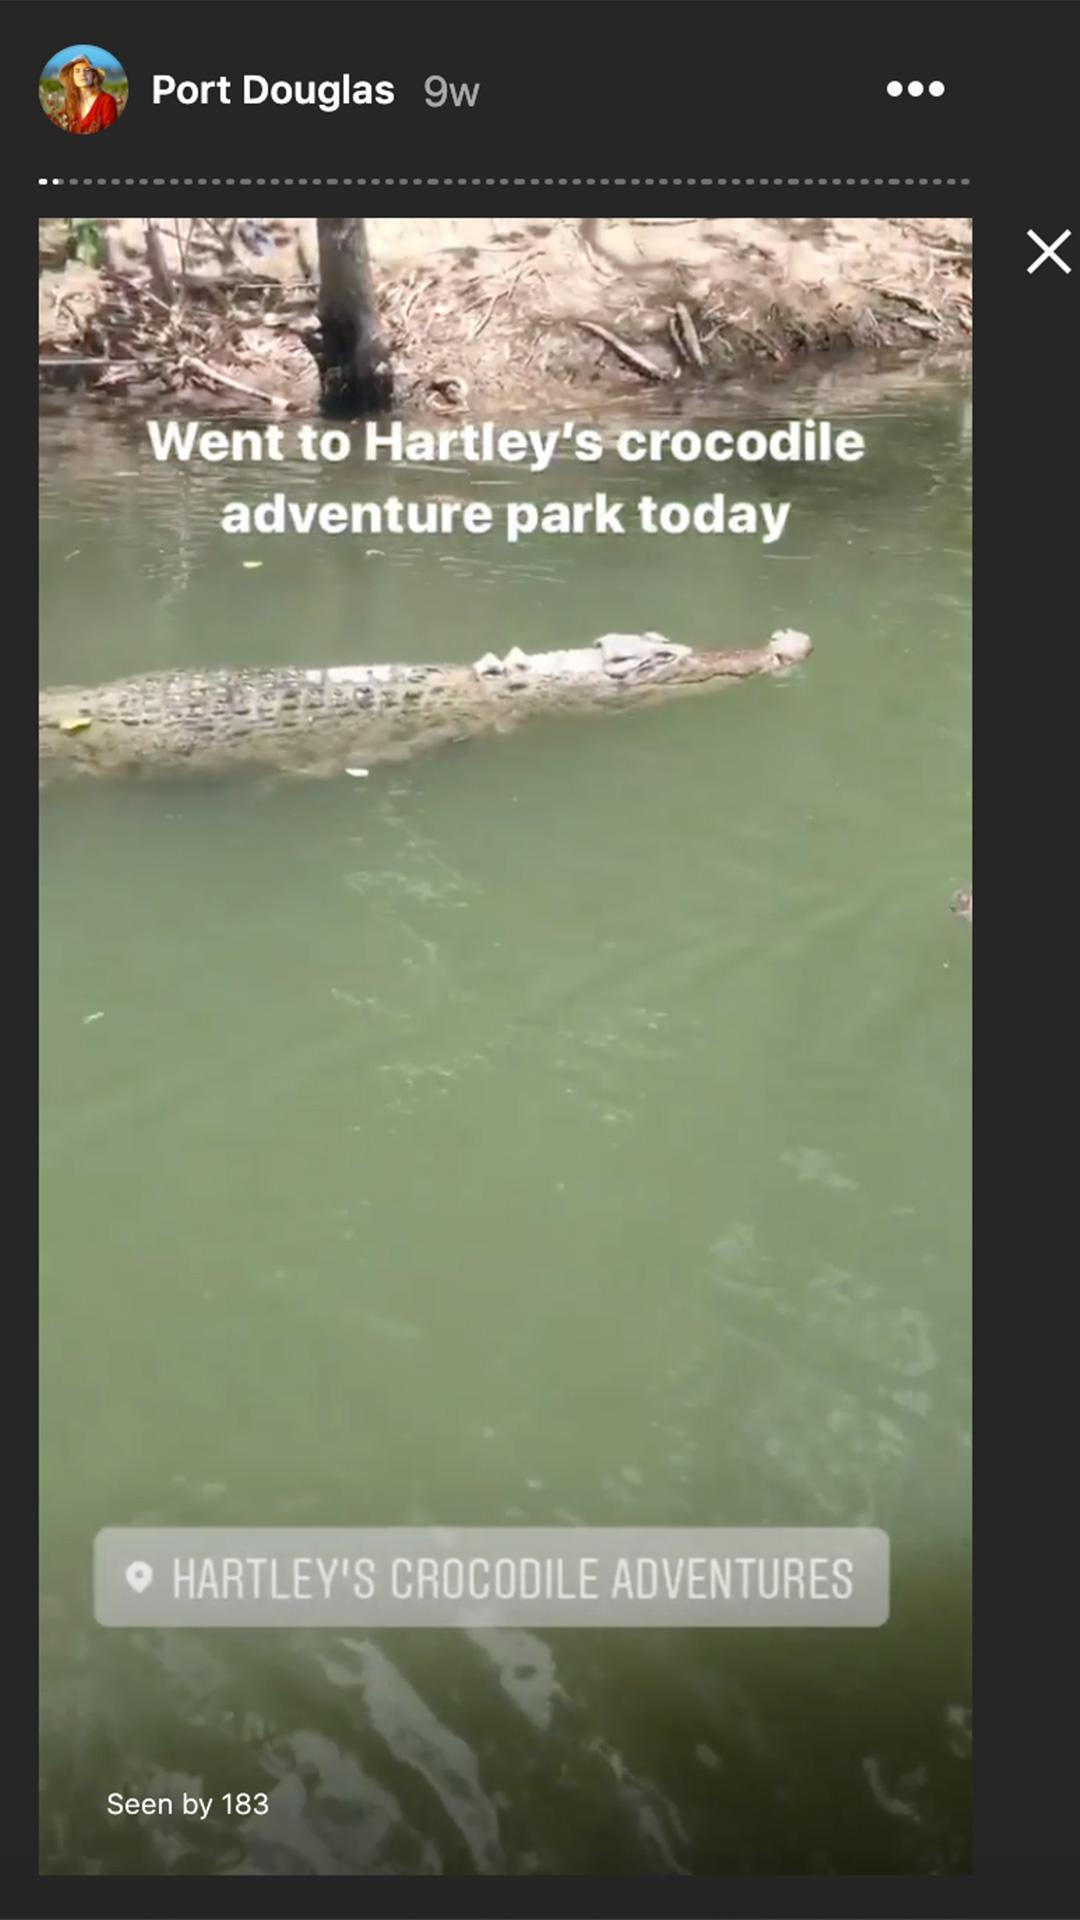 salt water crocodile at hartley's adventure park in port douglas in australia